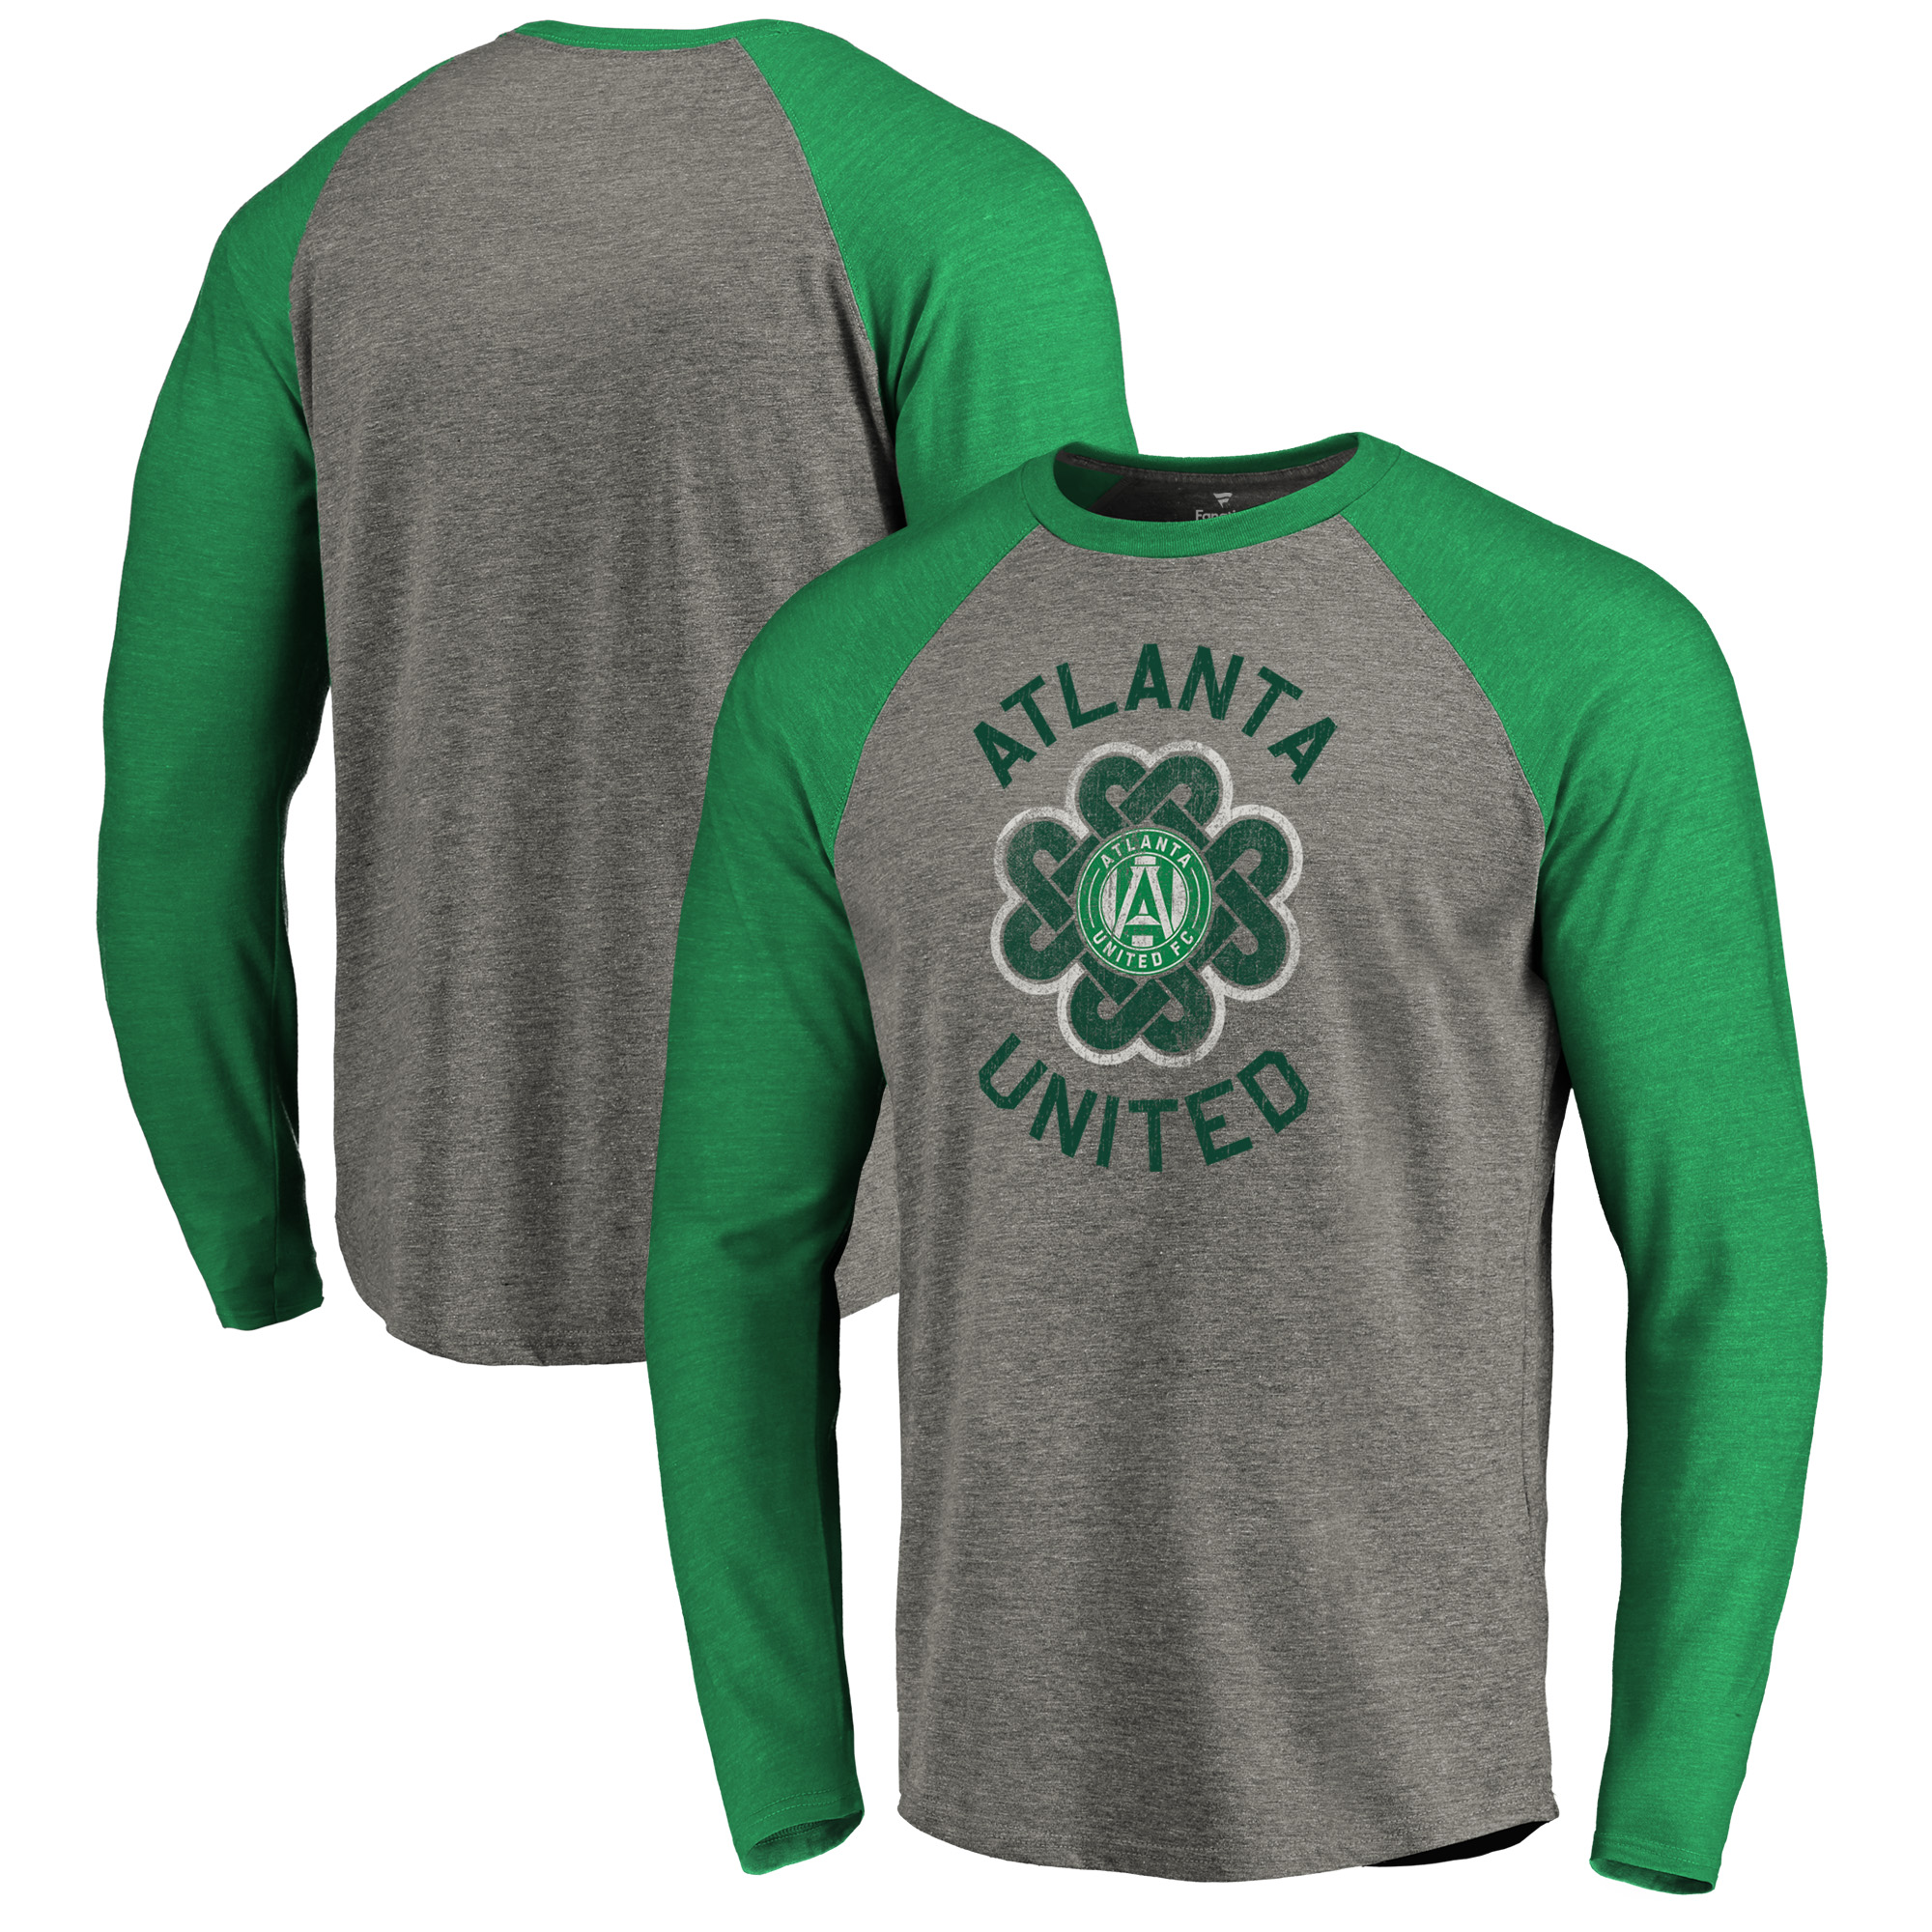 Atlanta United FC Fanatics Branded St. Patrick's Day Luck Tradition Raglan Tri-Blend Long Sleeve T-Shirt - Heathered Gray